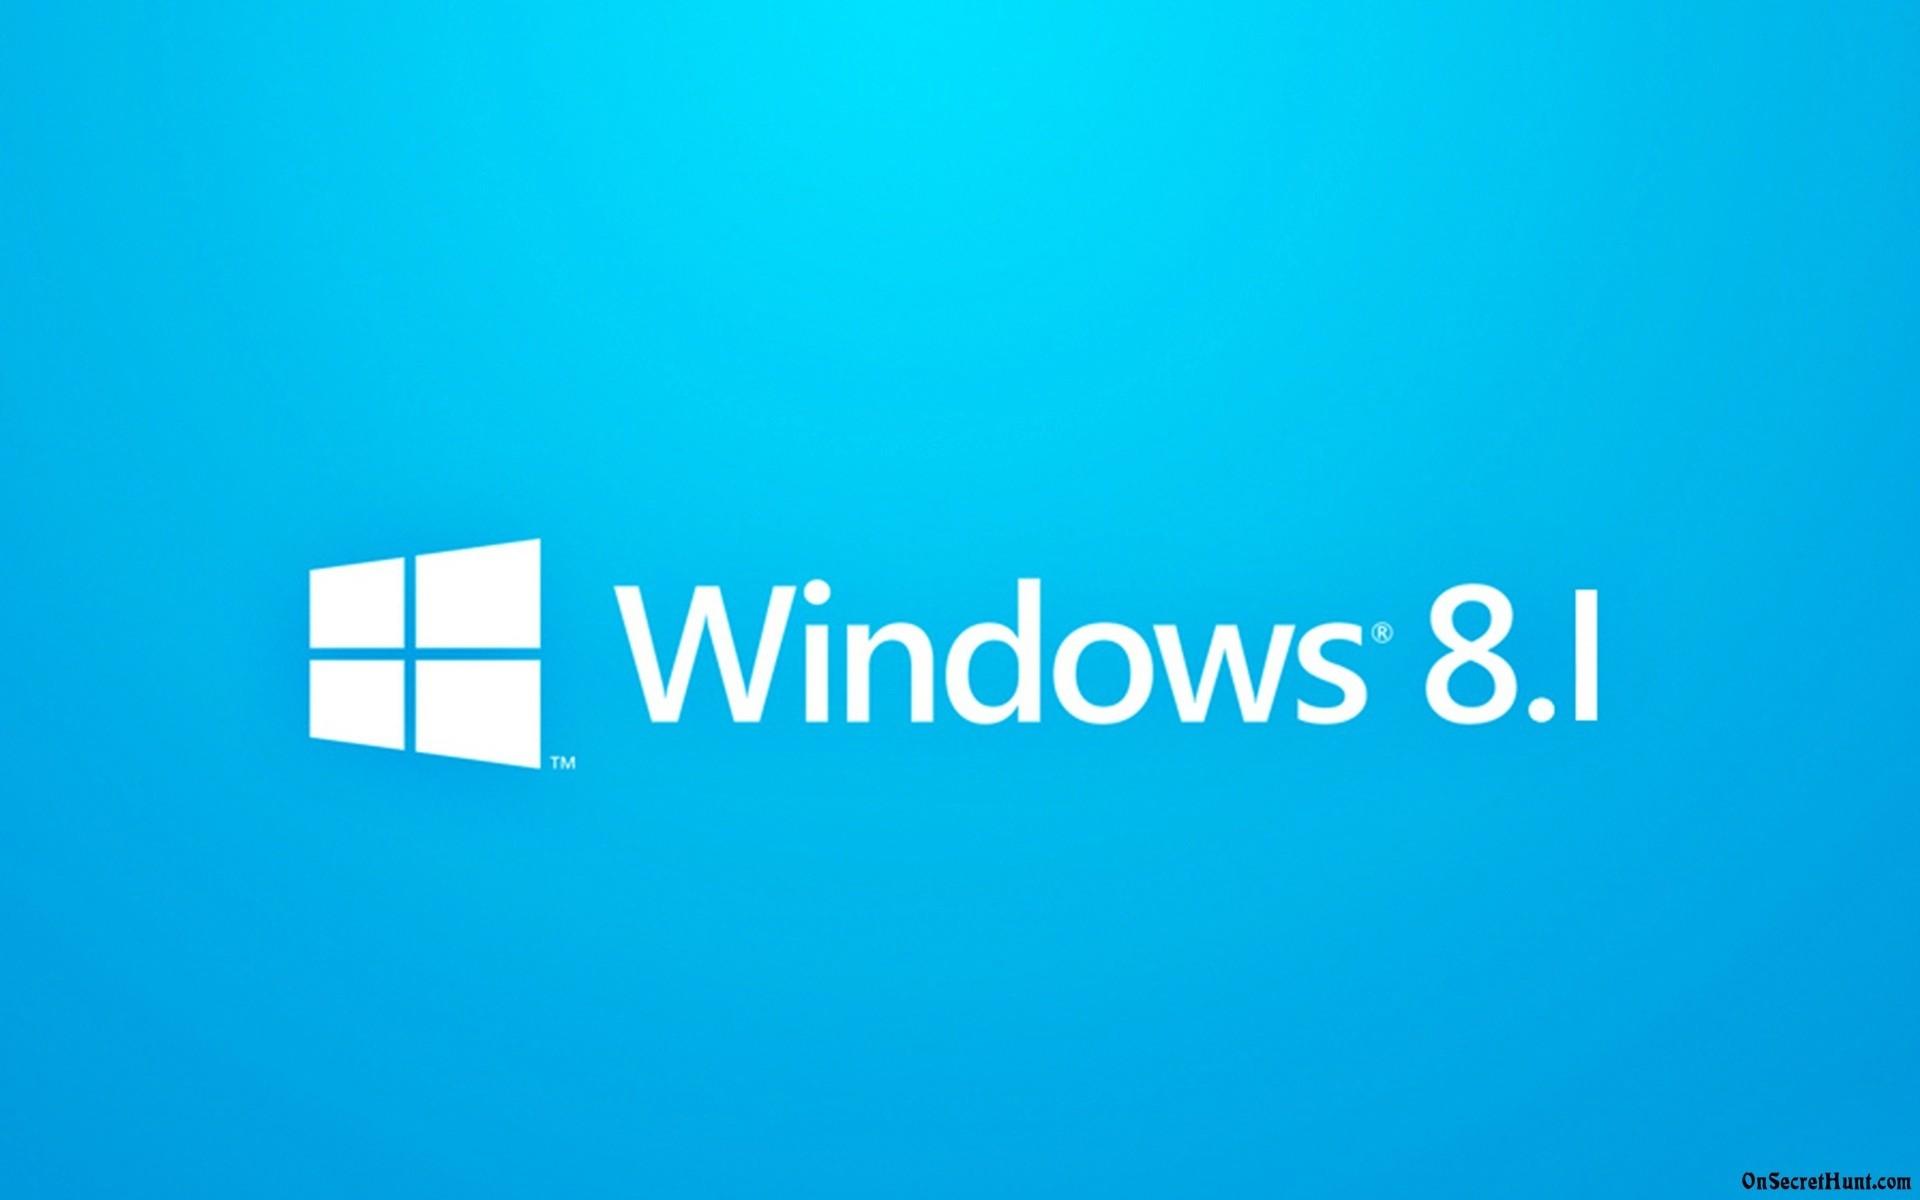 Microsoft Windows 8.1 | Download HD Wallpapers